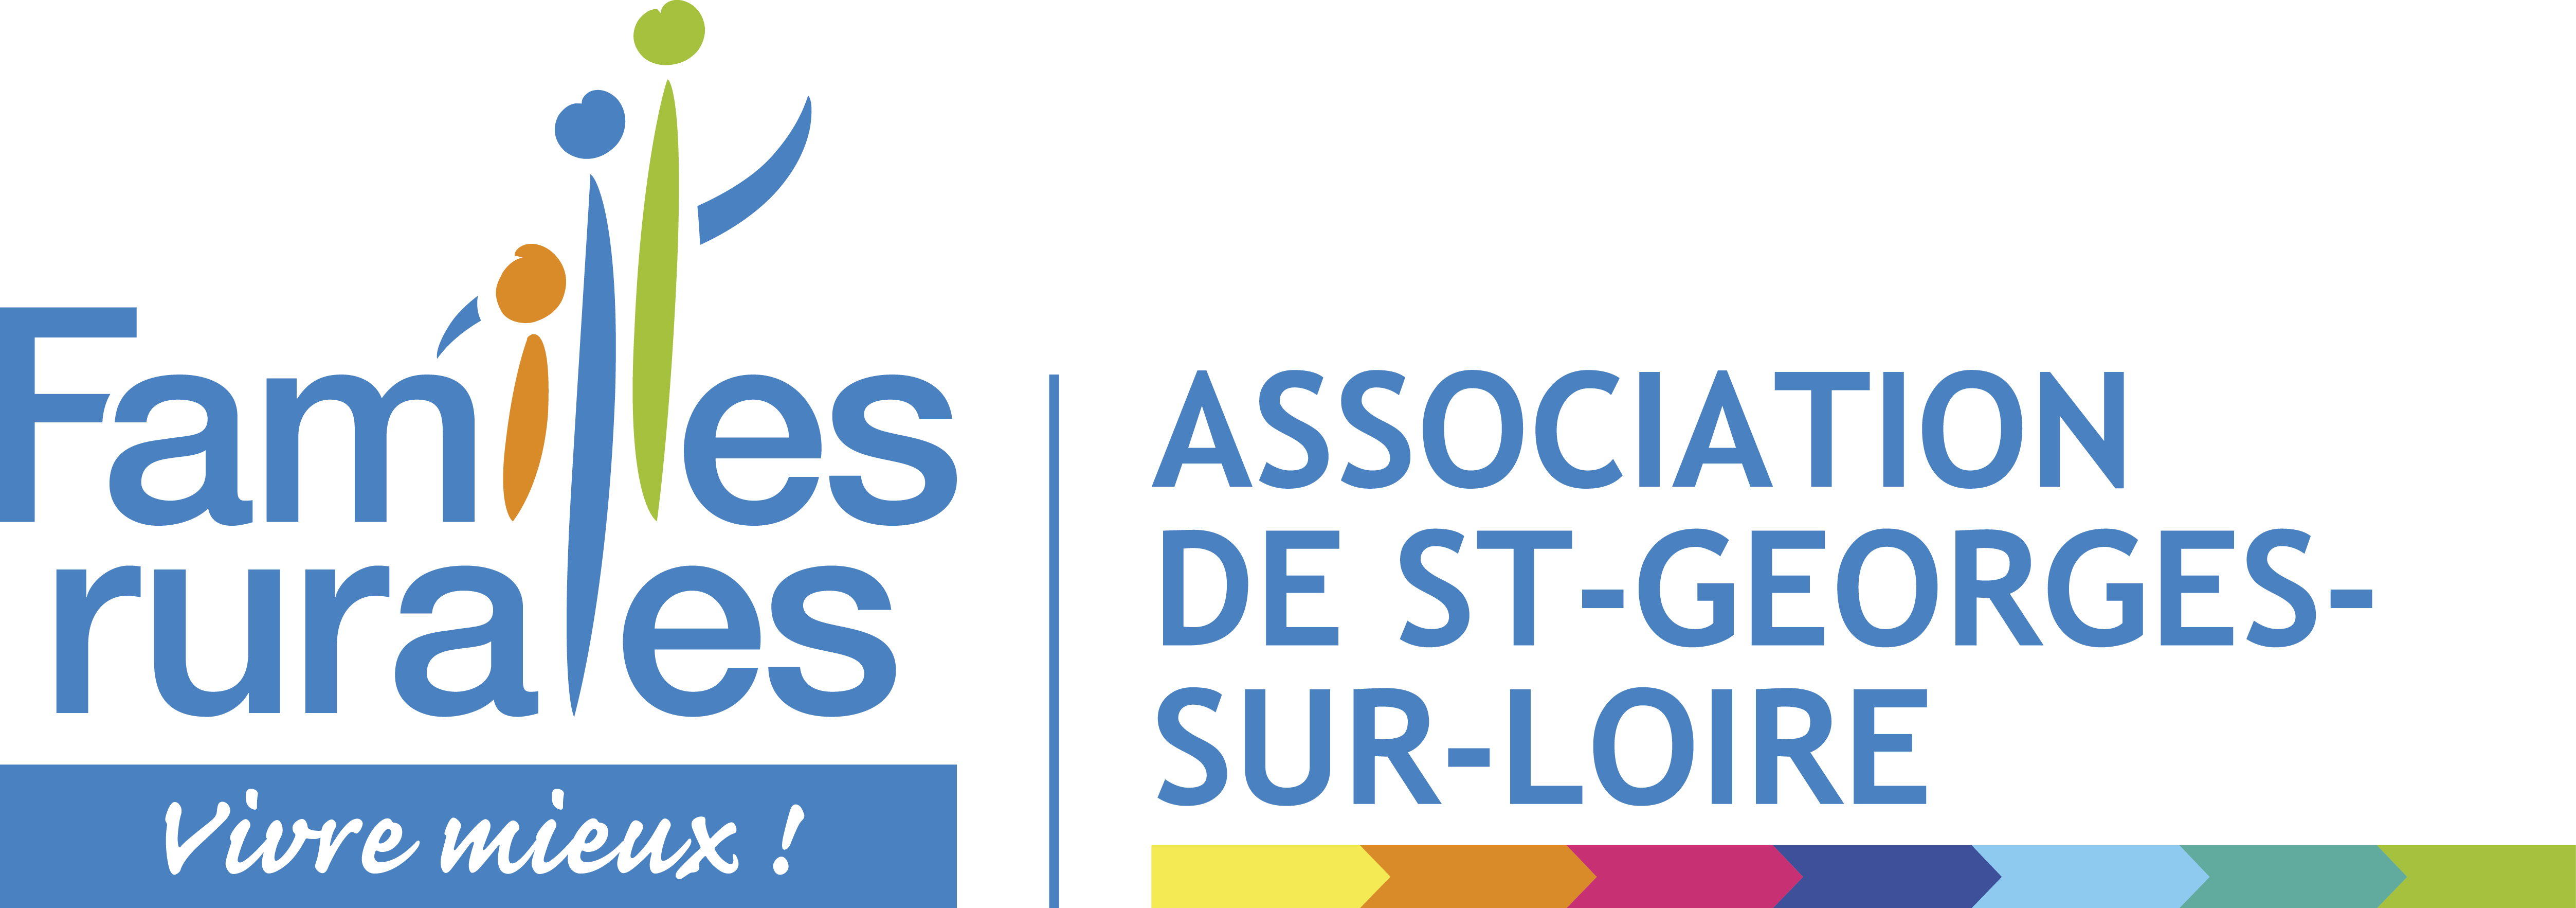 https://static.blog4ever.com/2012/04/684288/logo_ST_GEORGES_LOIRE_quadri.png